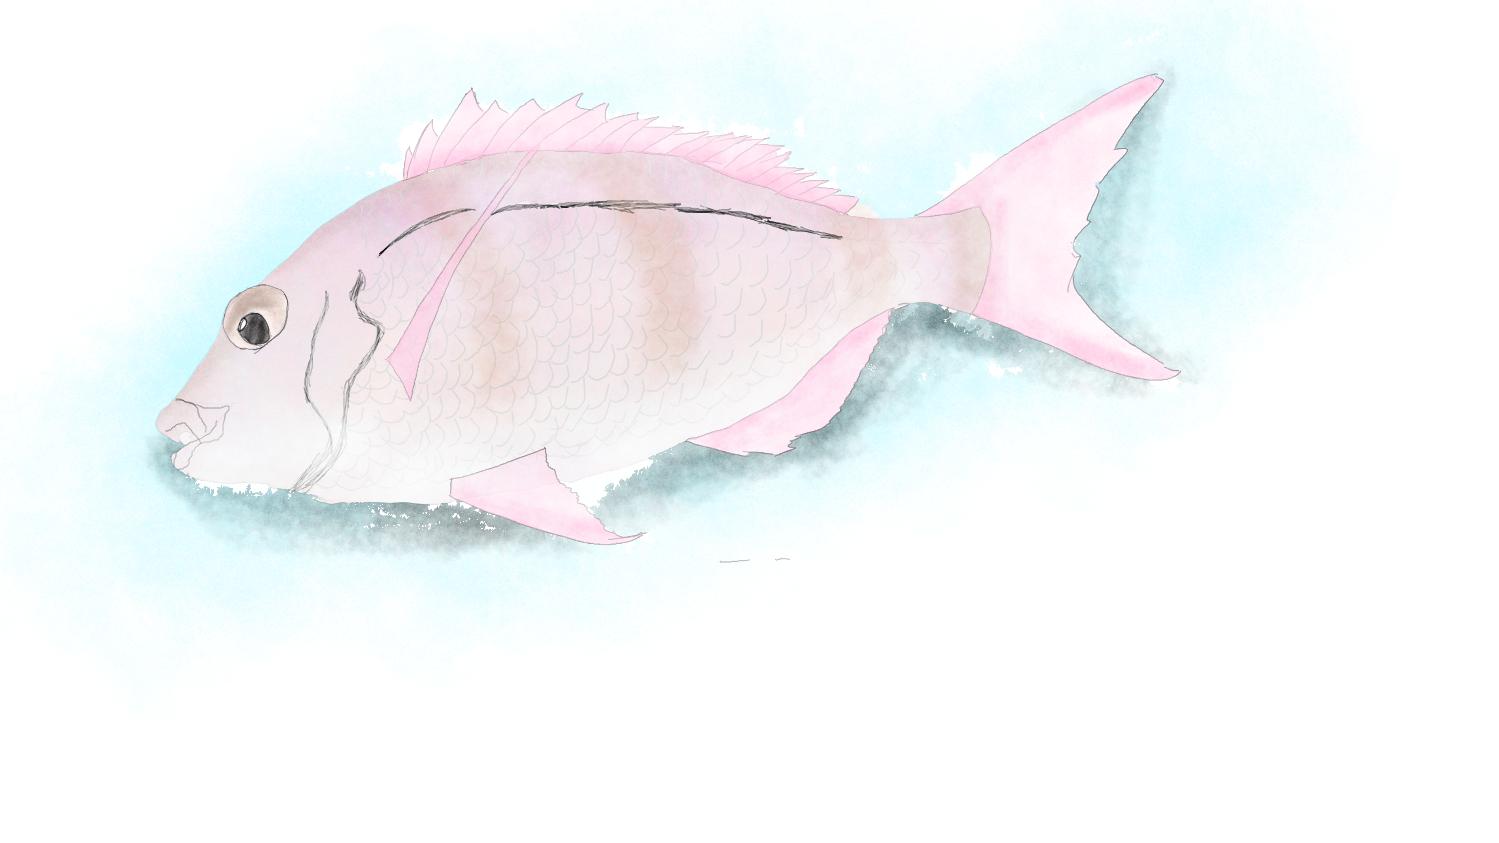 鯛/Snapper,Australia,NZ